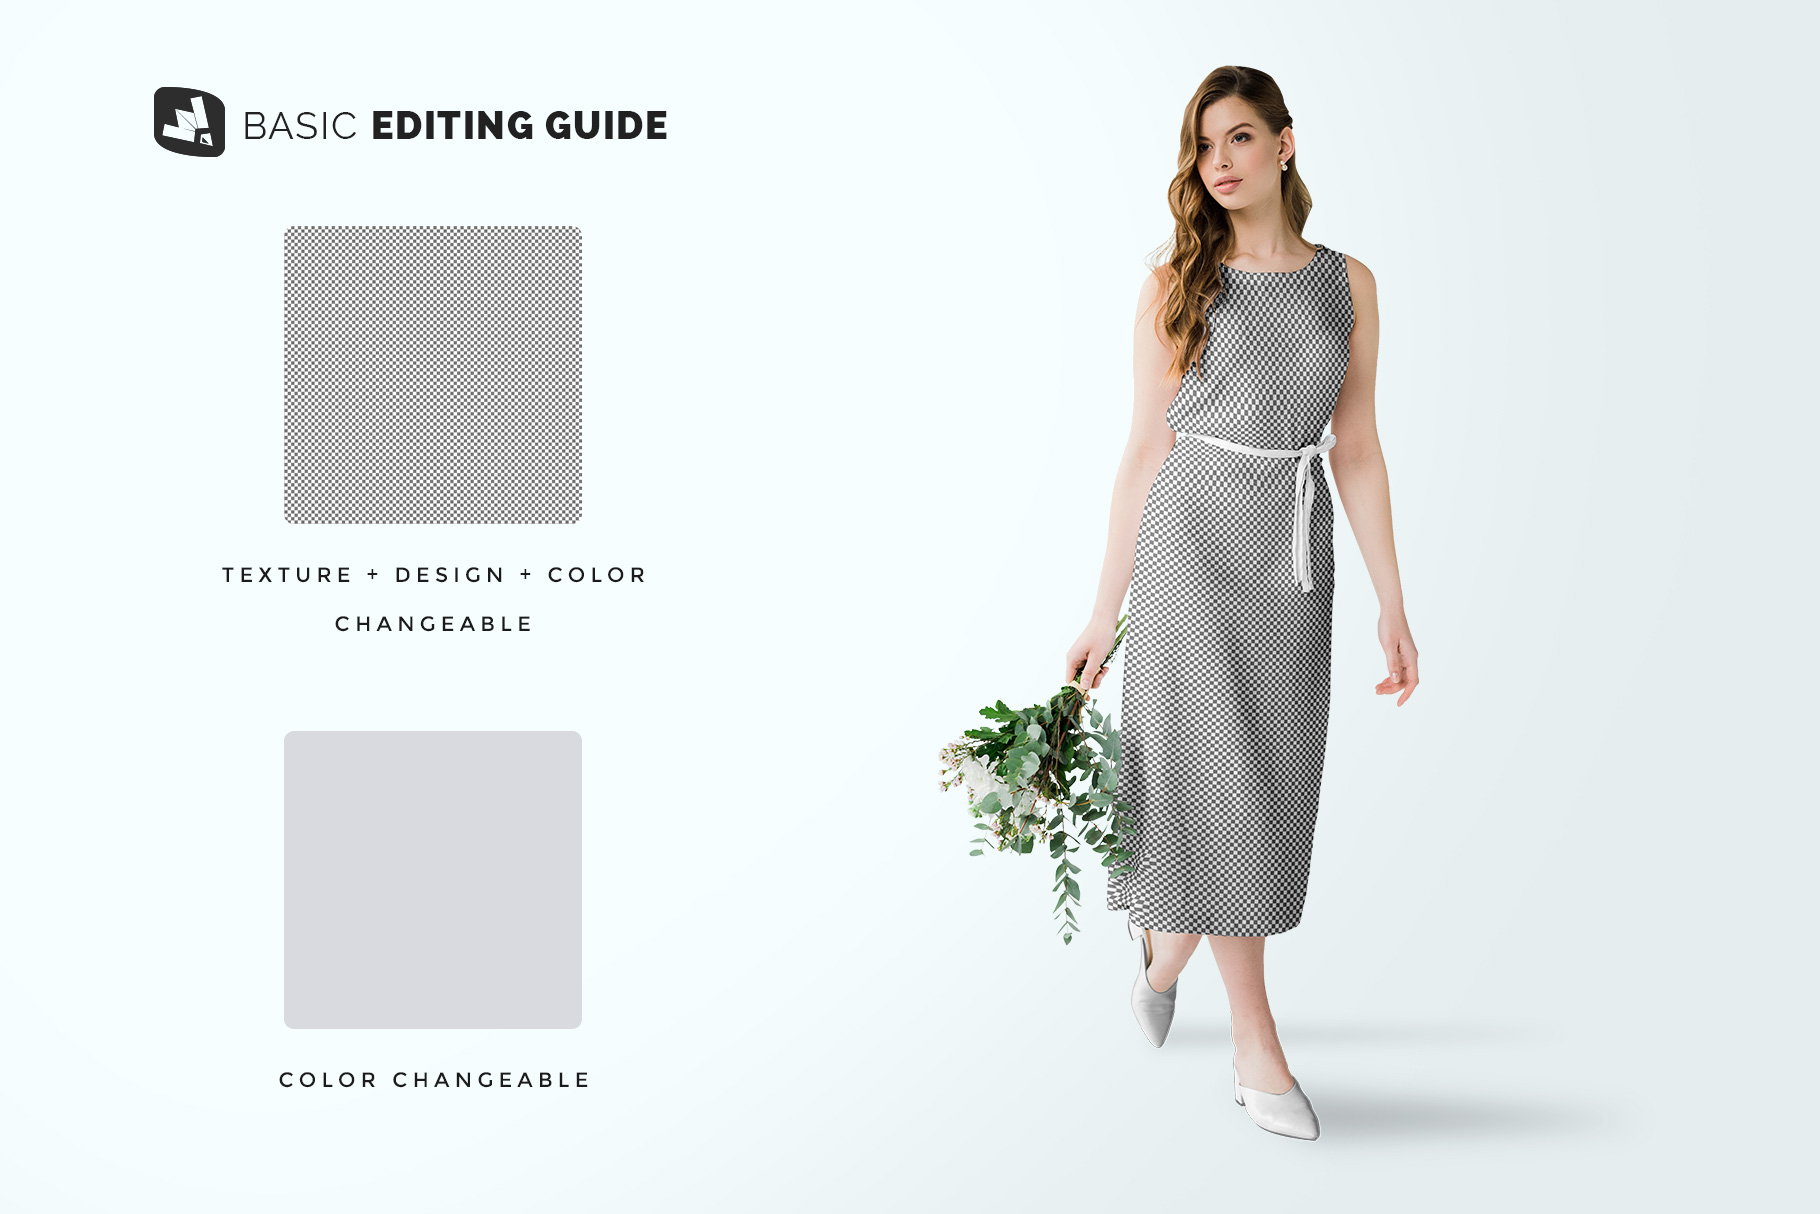 editability of the female cotton summer dress mockup